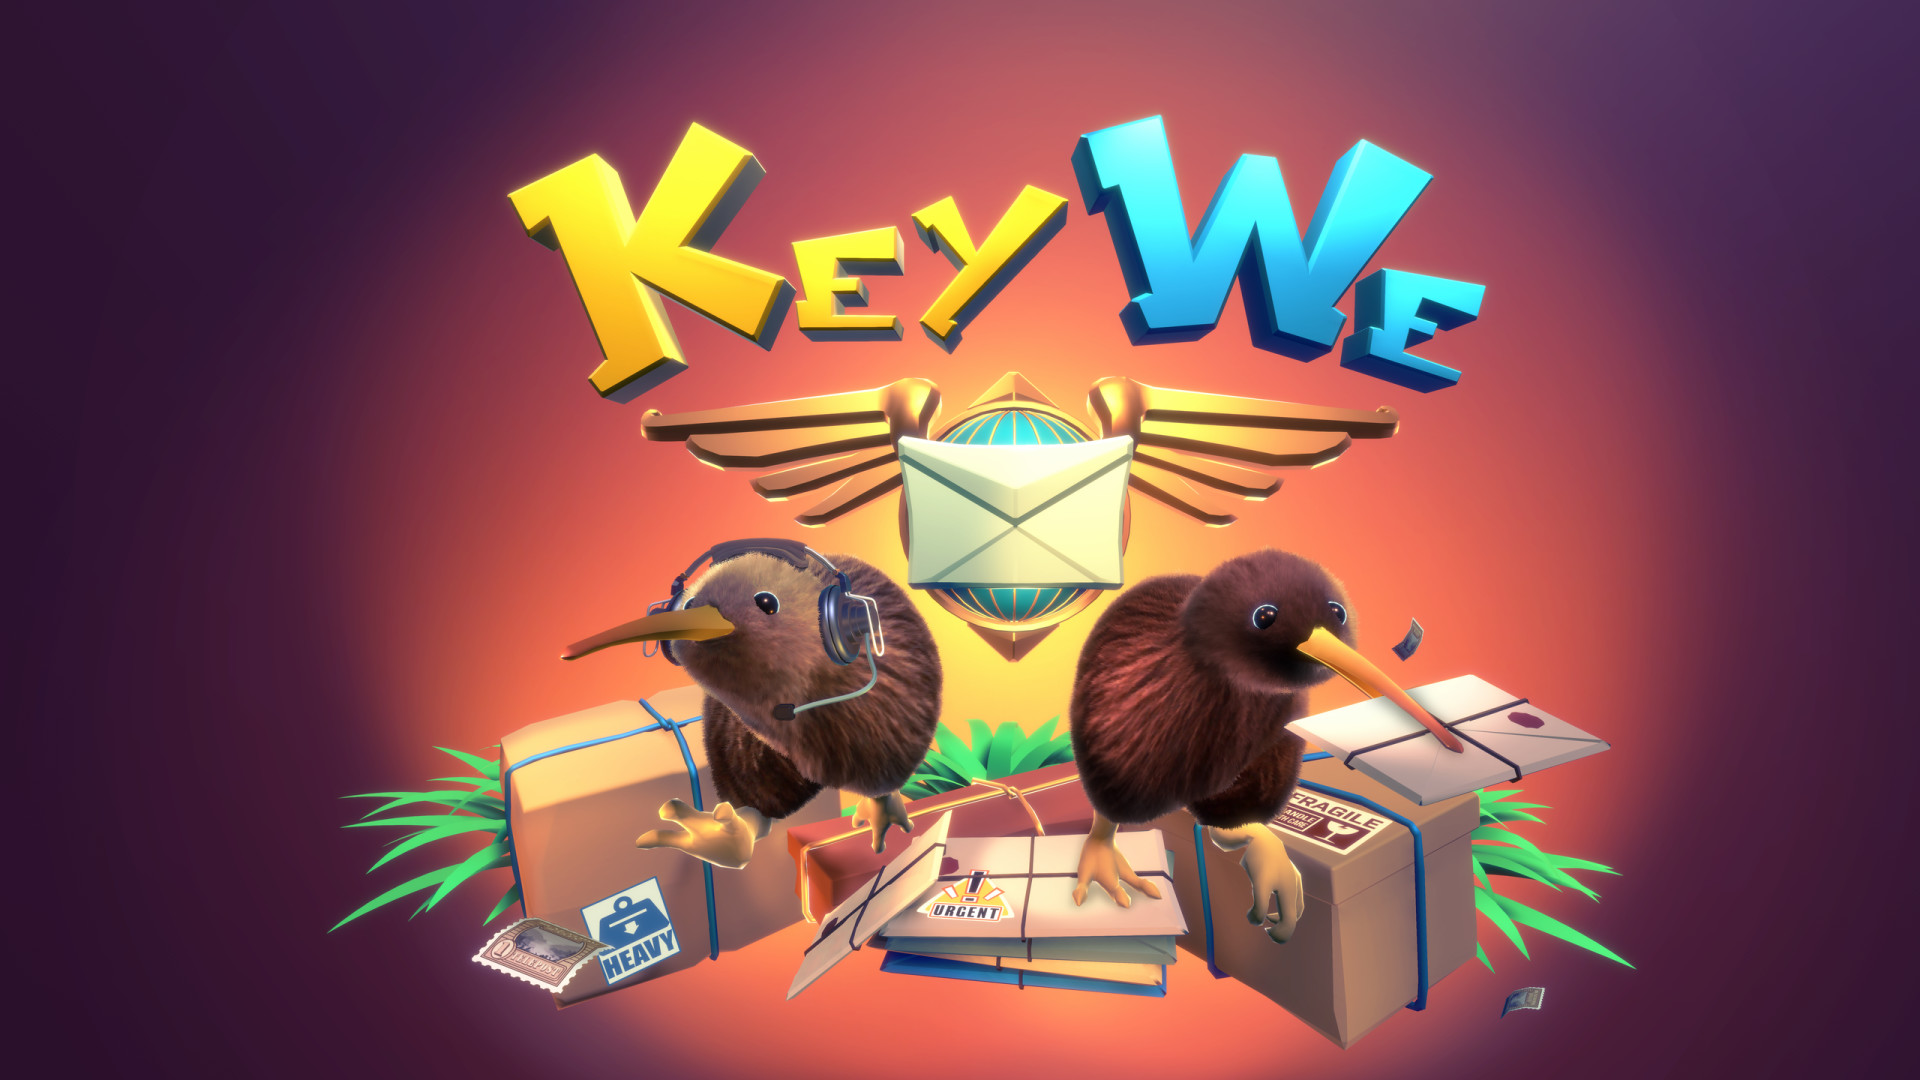 KeyWe in arrivo su PlayStation®5, PlayStation®4, Xbox Series X | S, Xbox One & Nintendo Switch quest'estate